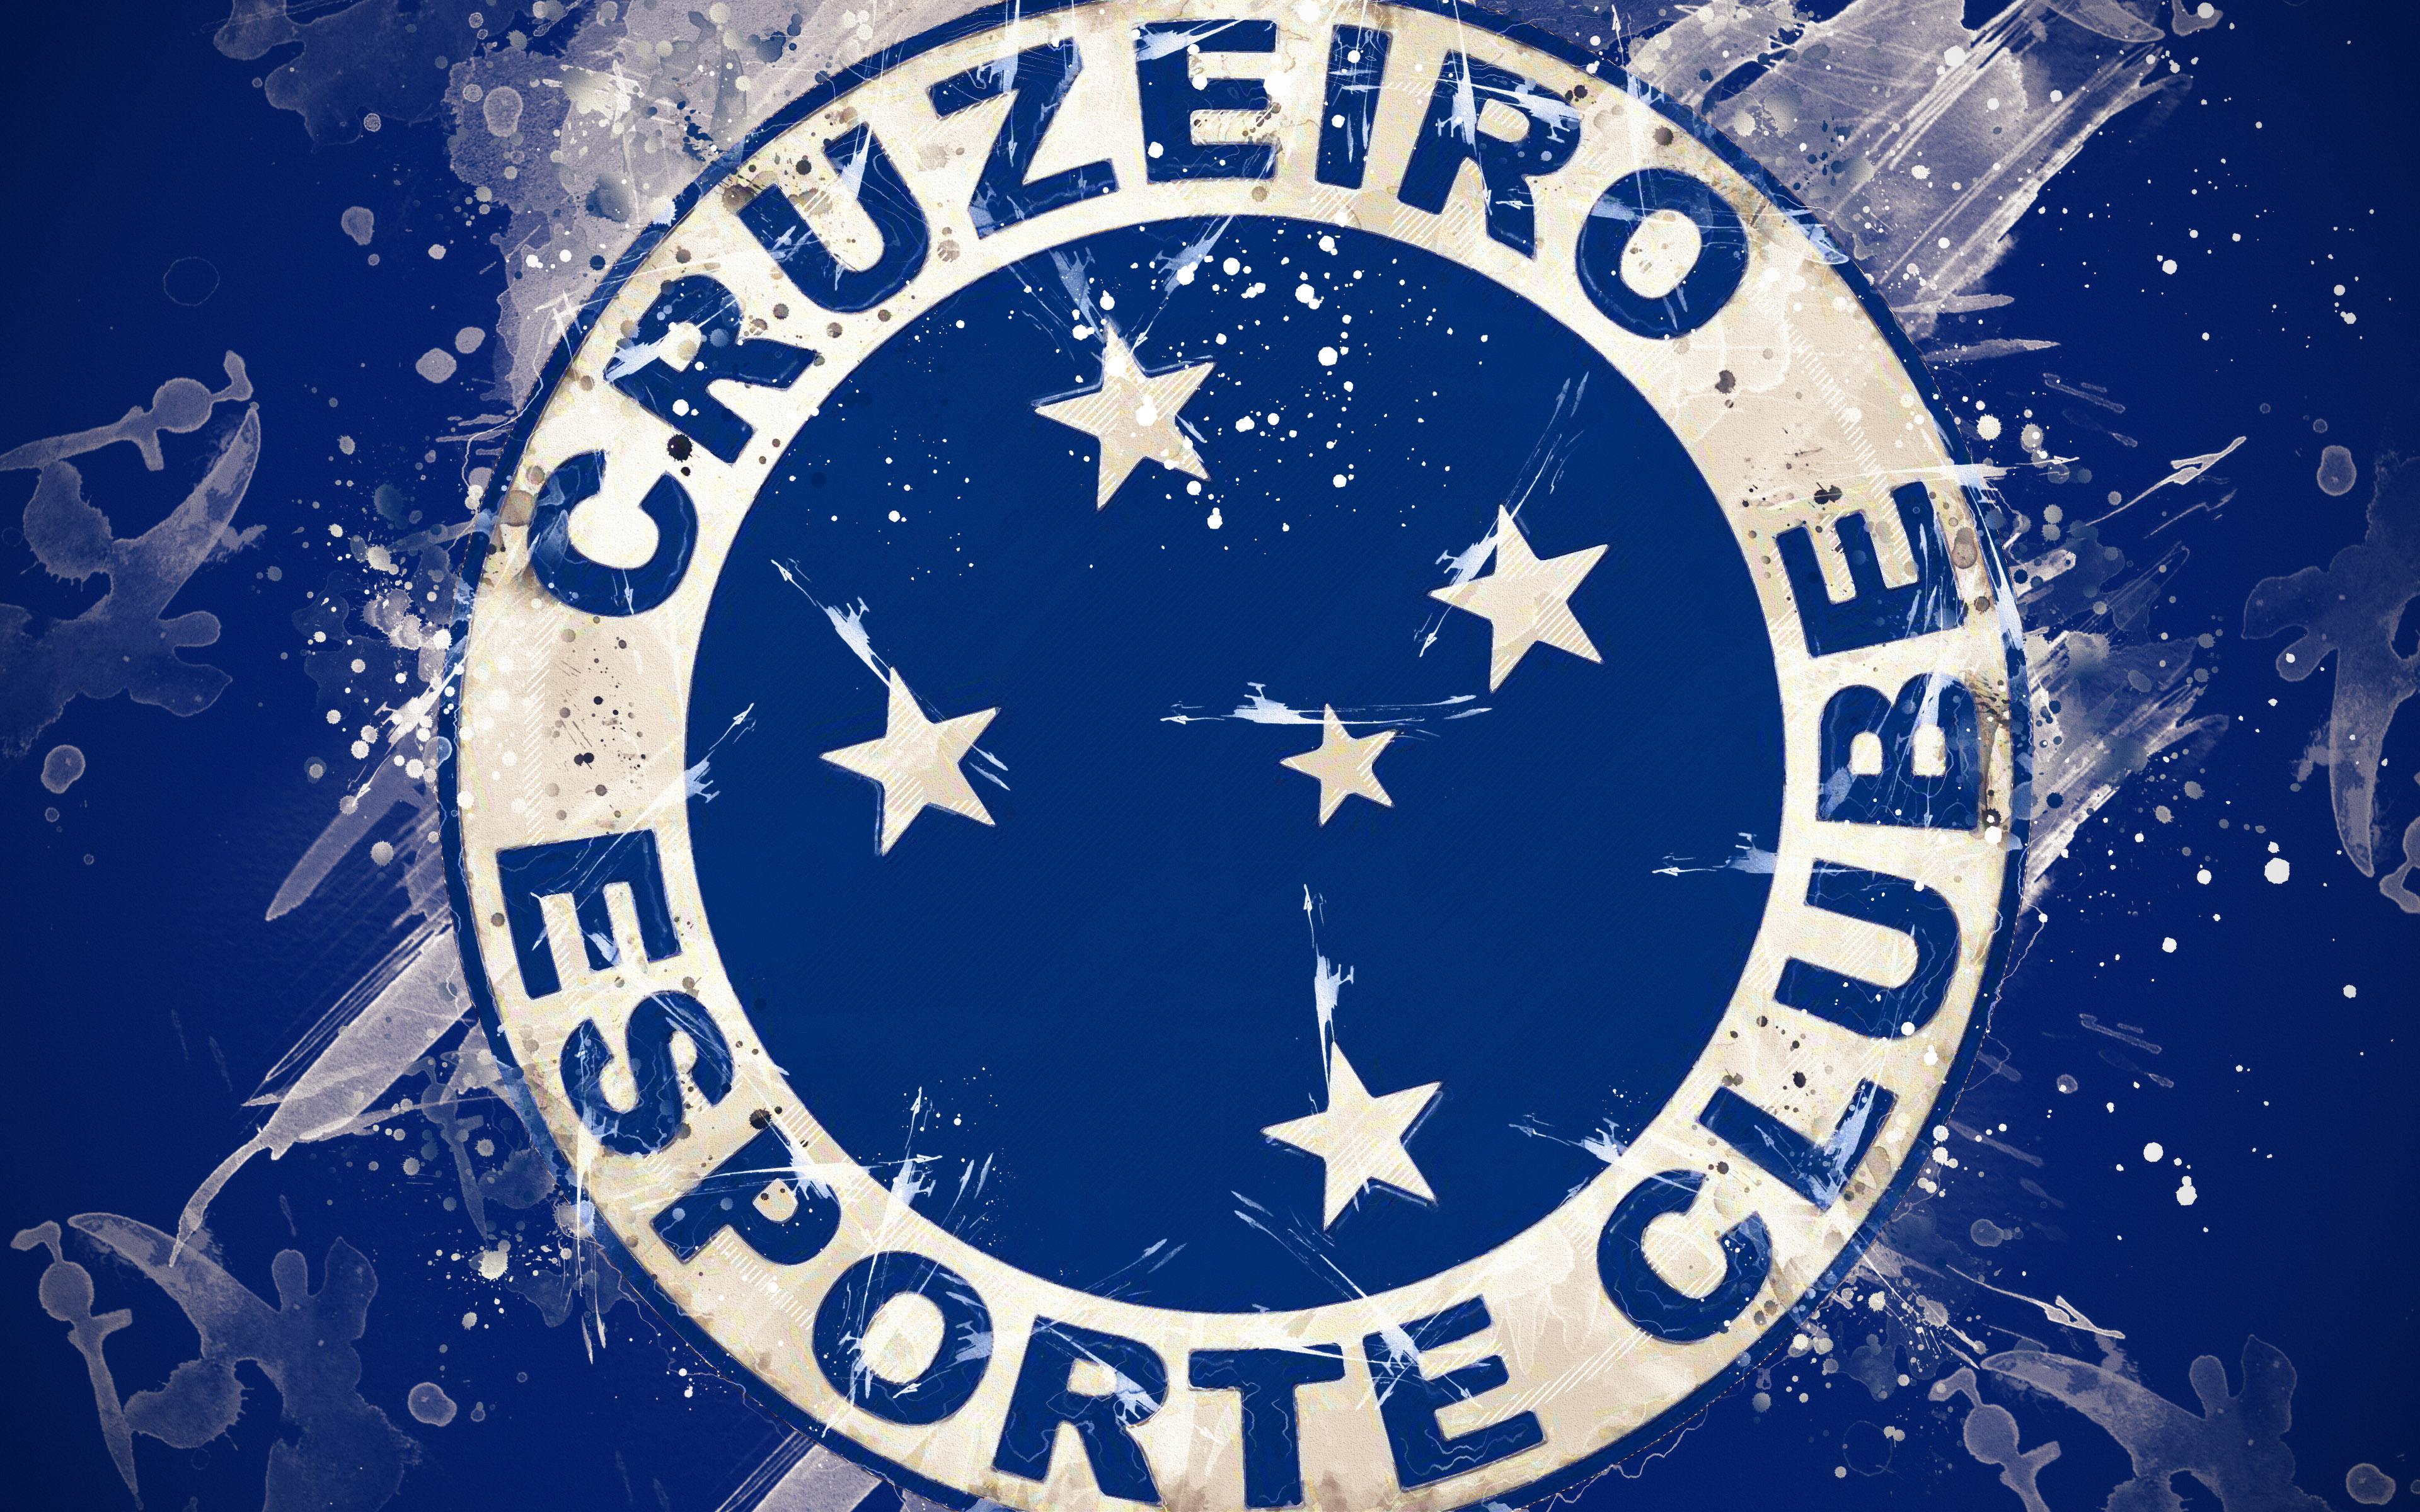 Cruzeiro Esporte Clube 4k Ultra HD Wallpaper  e82fc73d8bb23